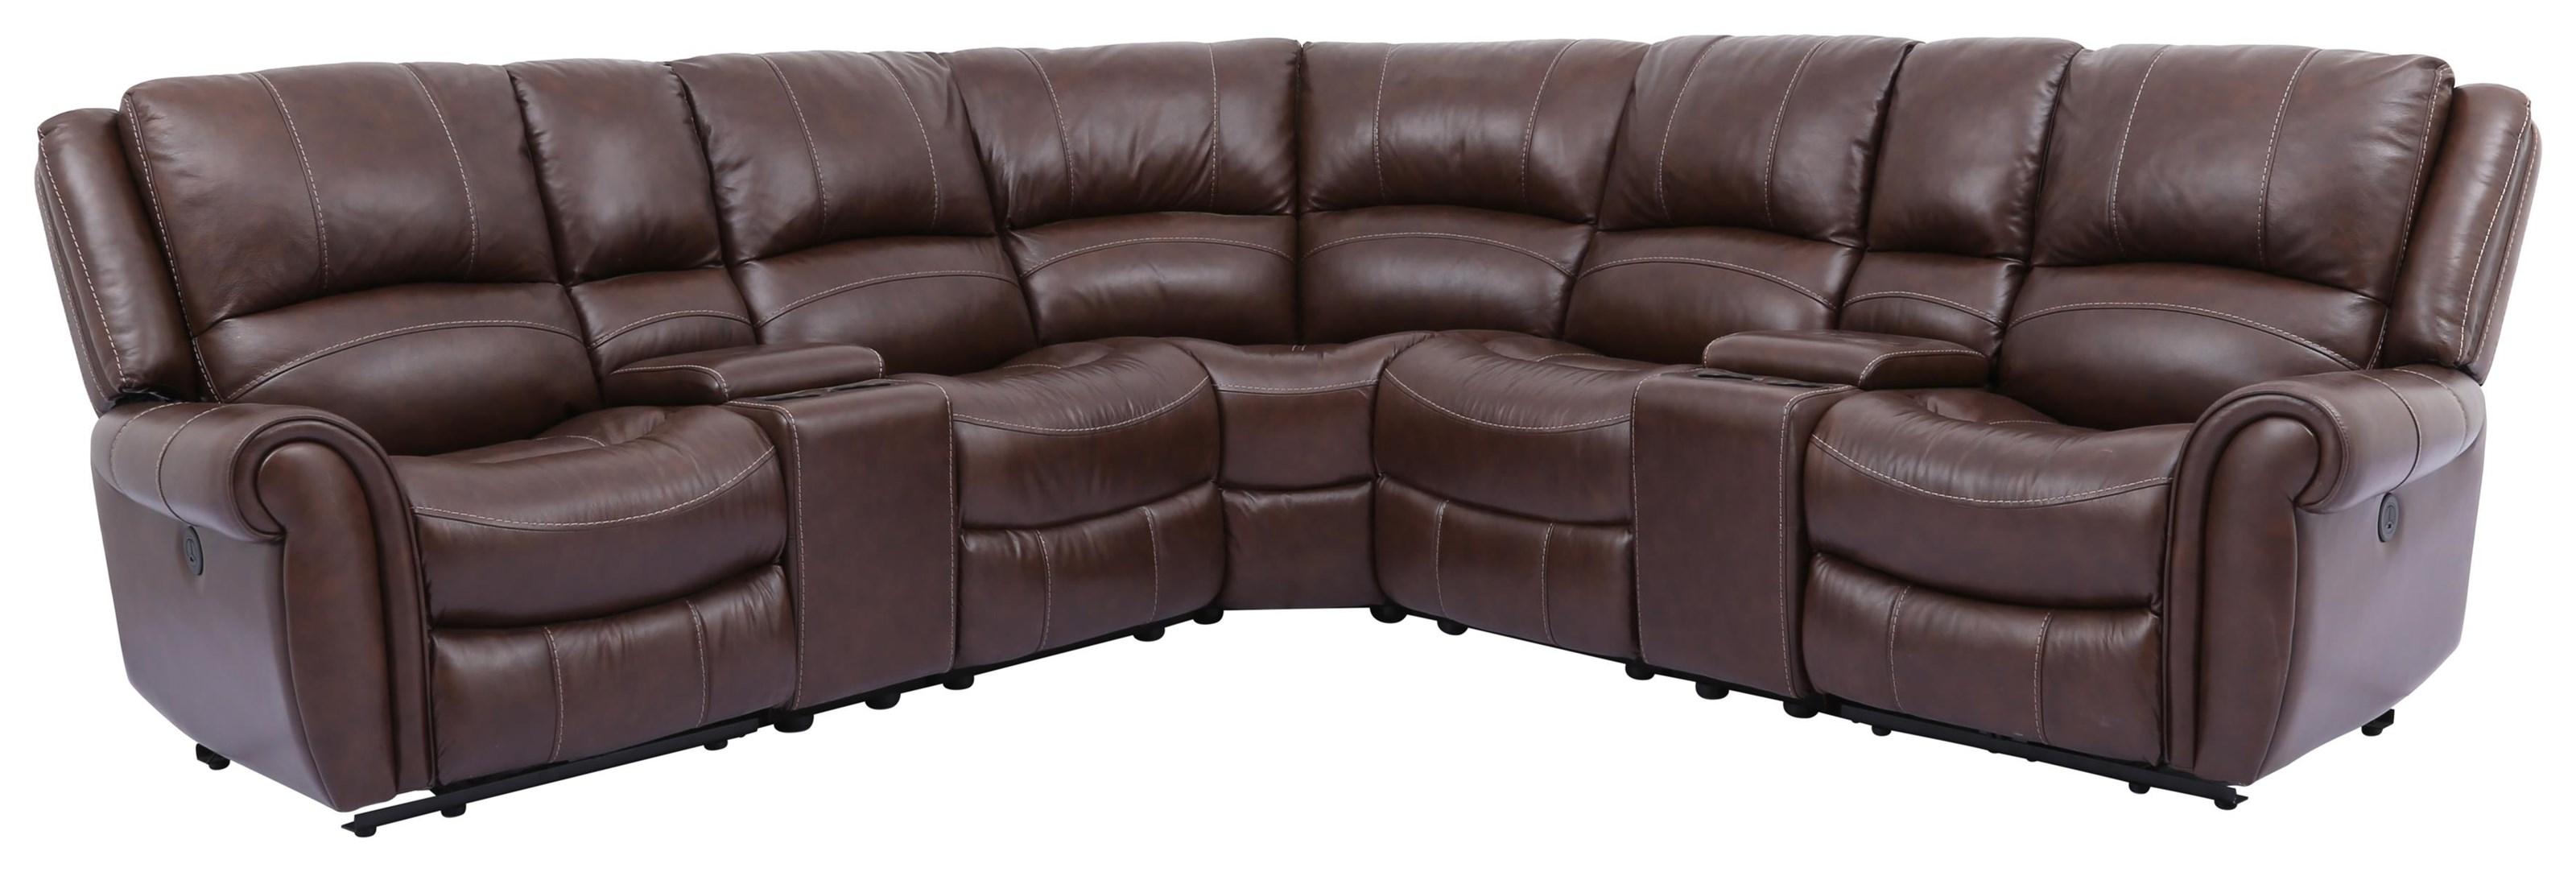 Rowan Leather 7 Piece Power Reclining Sectional